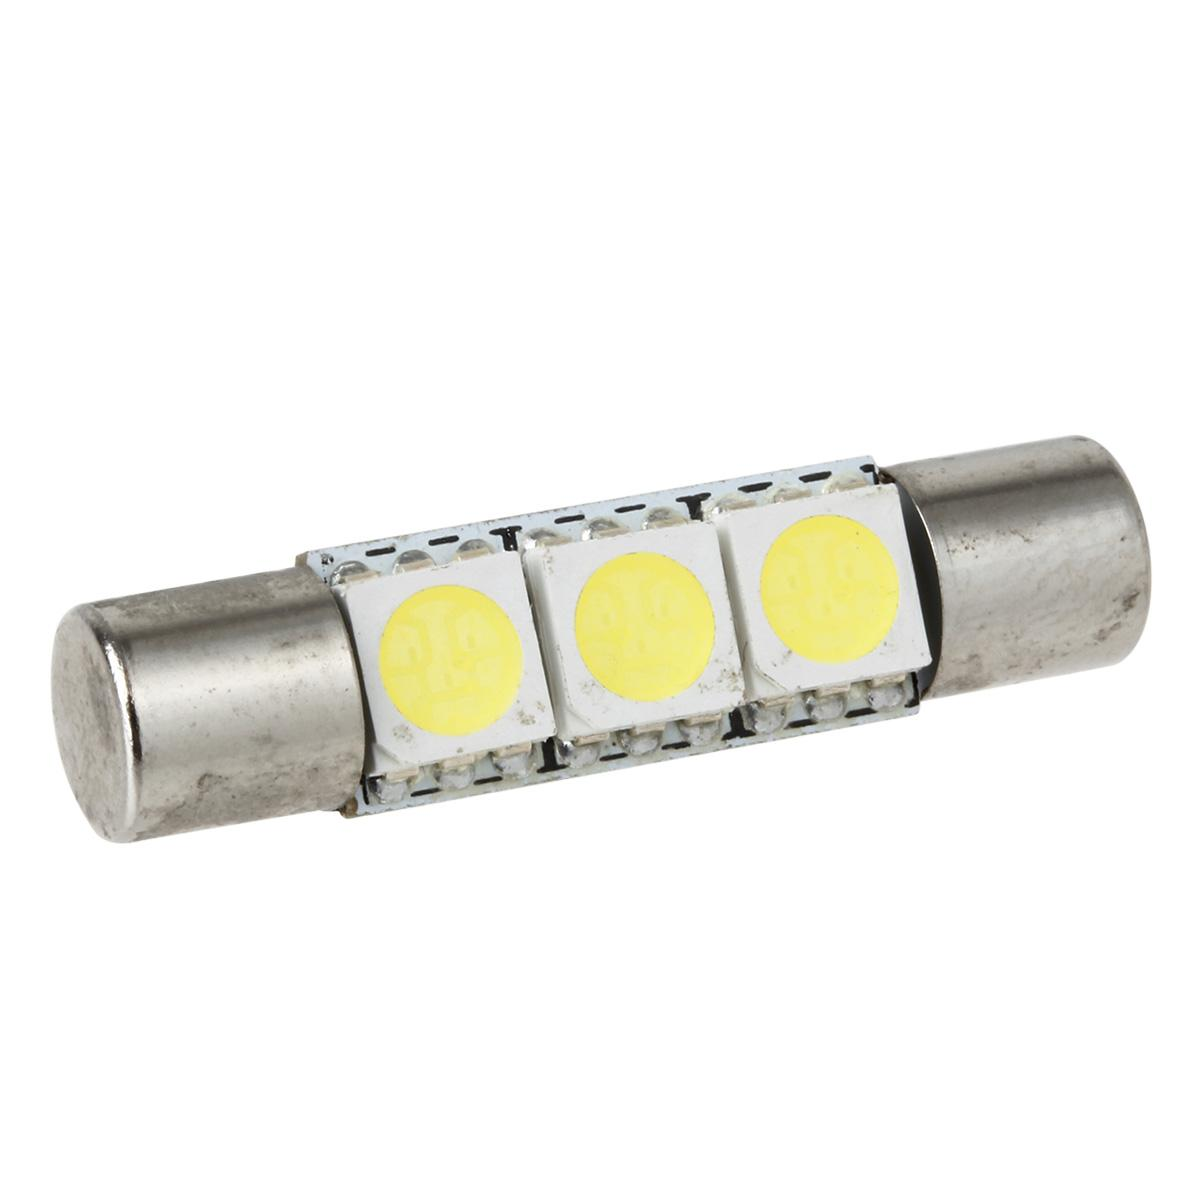 Vanity Mirror Led Light Bulbs : 10x Xenon White 3SMD 5050 LED Bulbs Interior Sun Visor Vanity Mirror Lights 6641 eBay